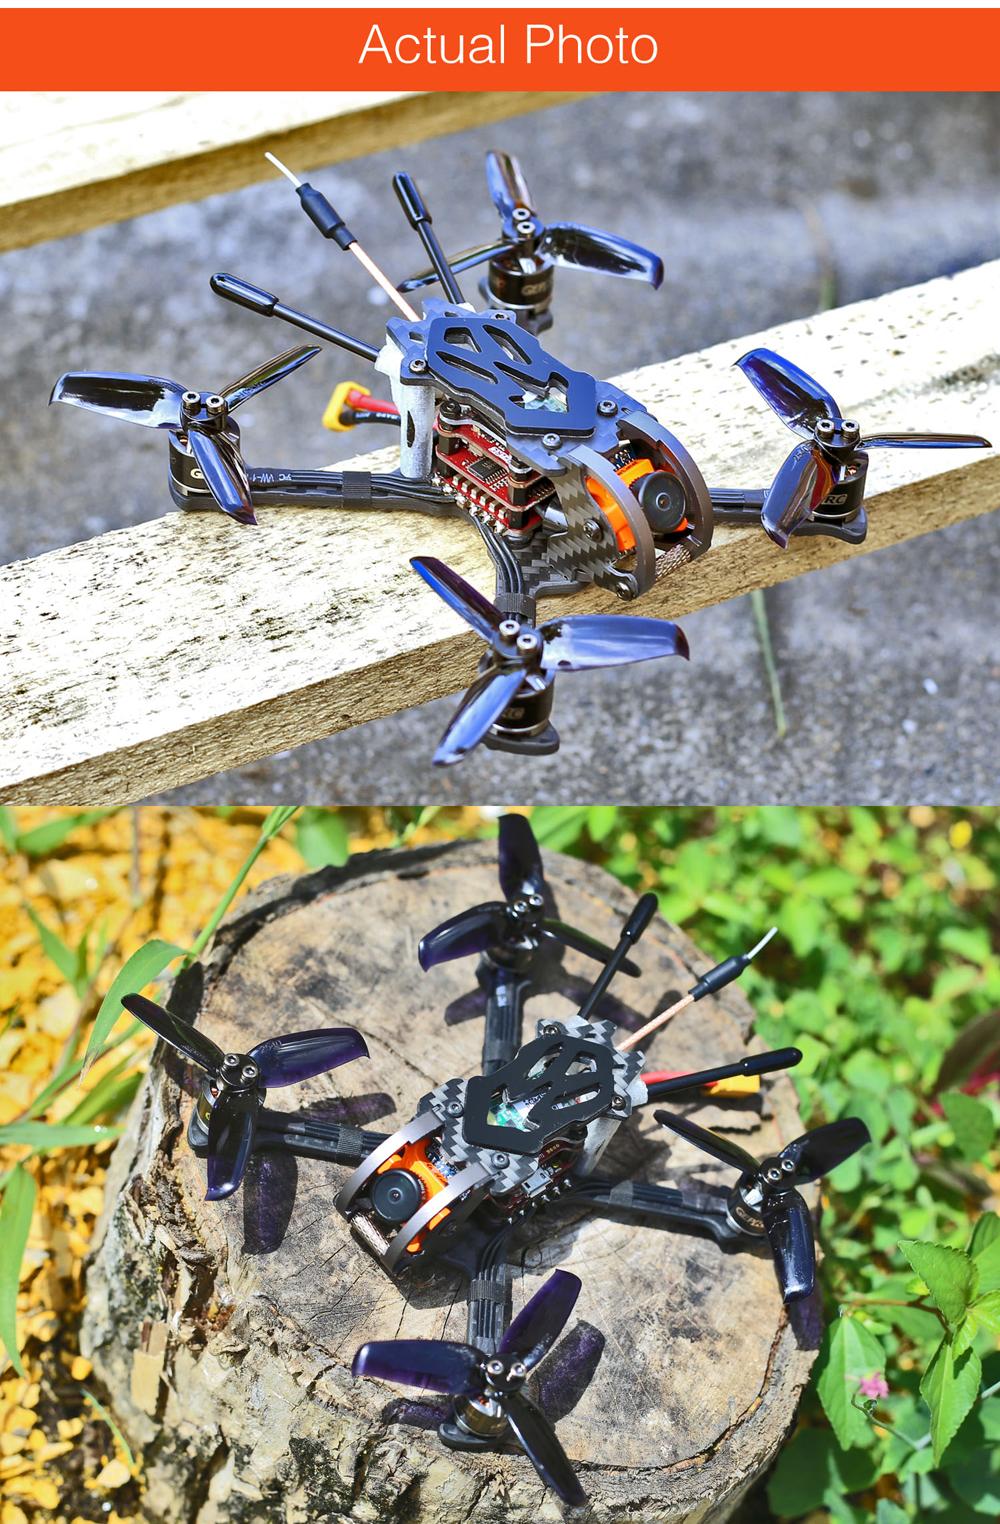 Summer Prime Sale GEPRC GEP-Phoenix 125mm FPV Racing Drone BNF Omnibus F4 RunCam Micro Swift 600TVL Camera - Photo: 9